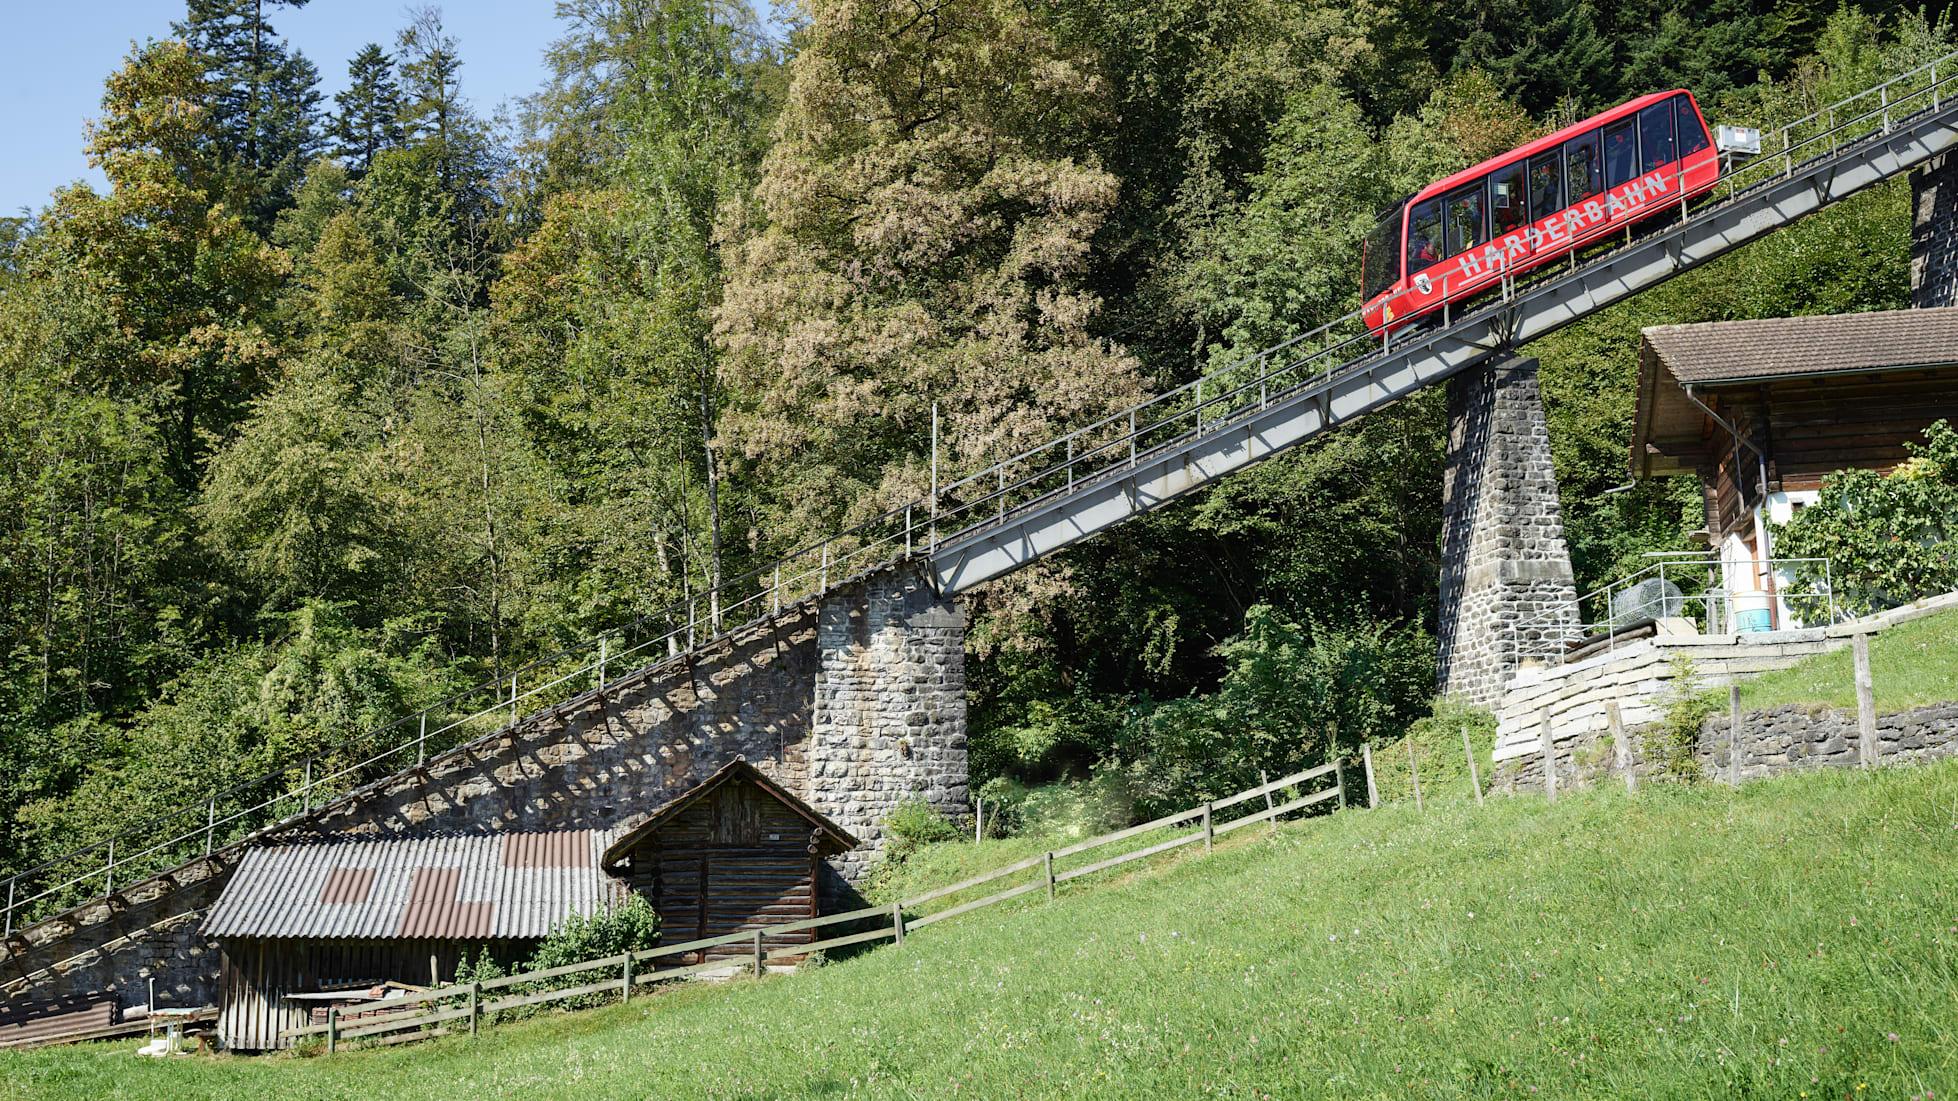 Harderbahn Sommer Wald